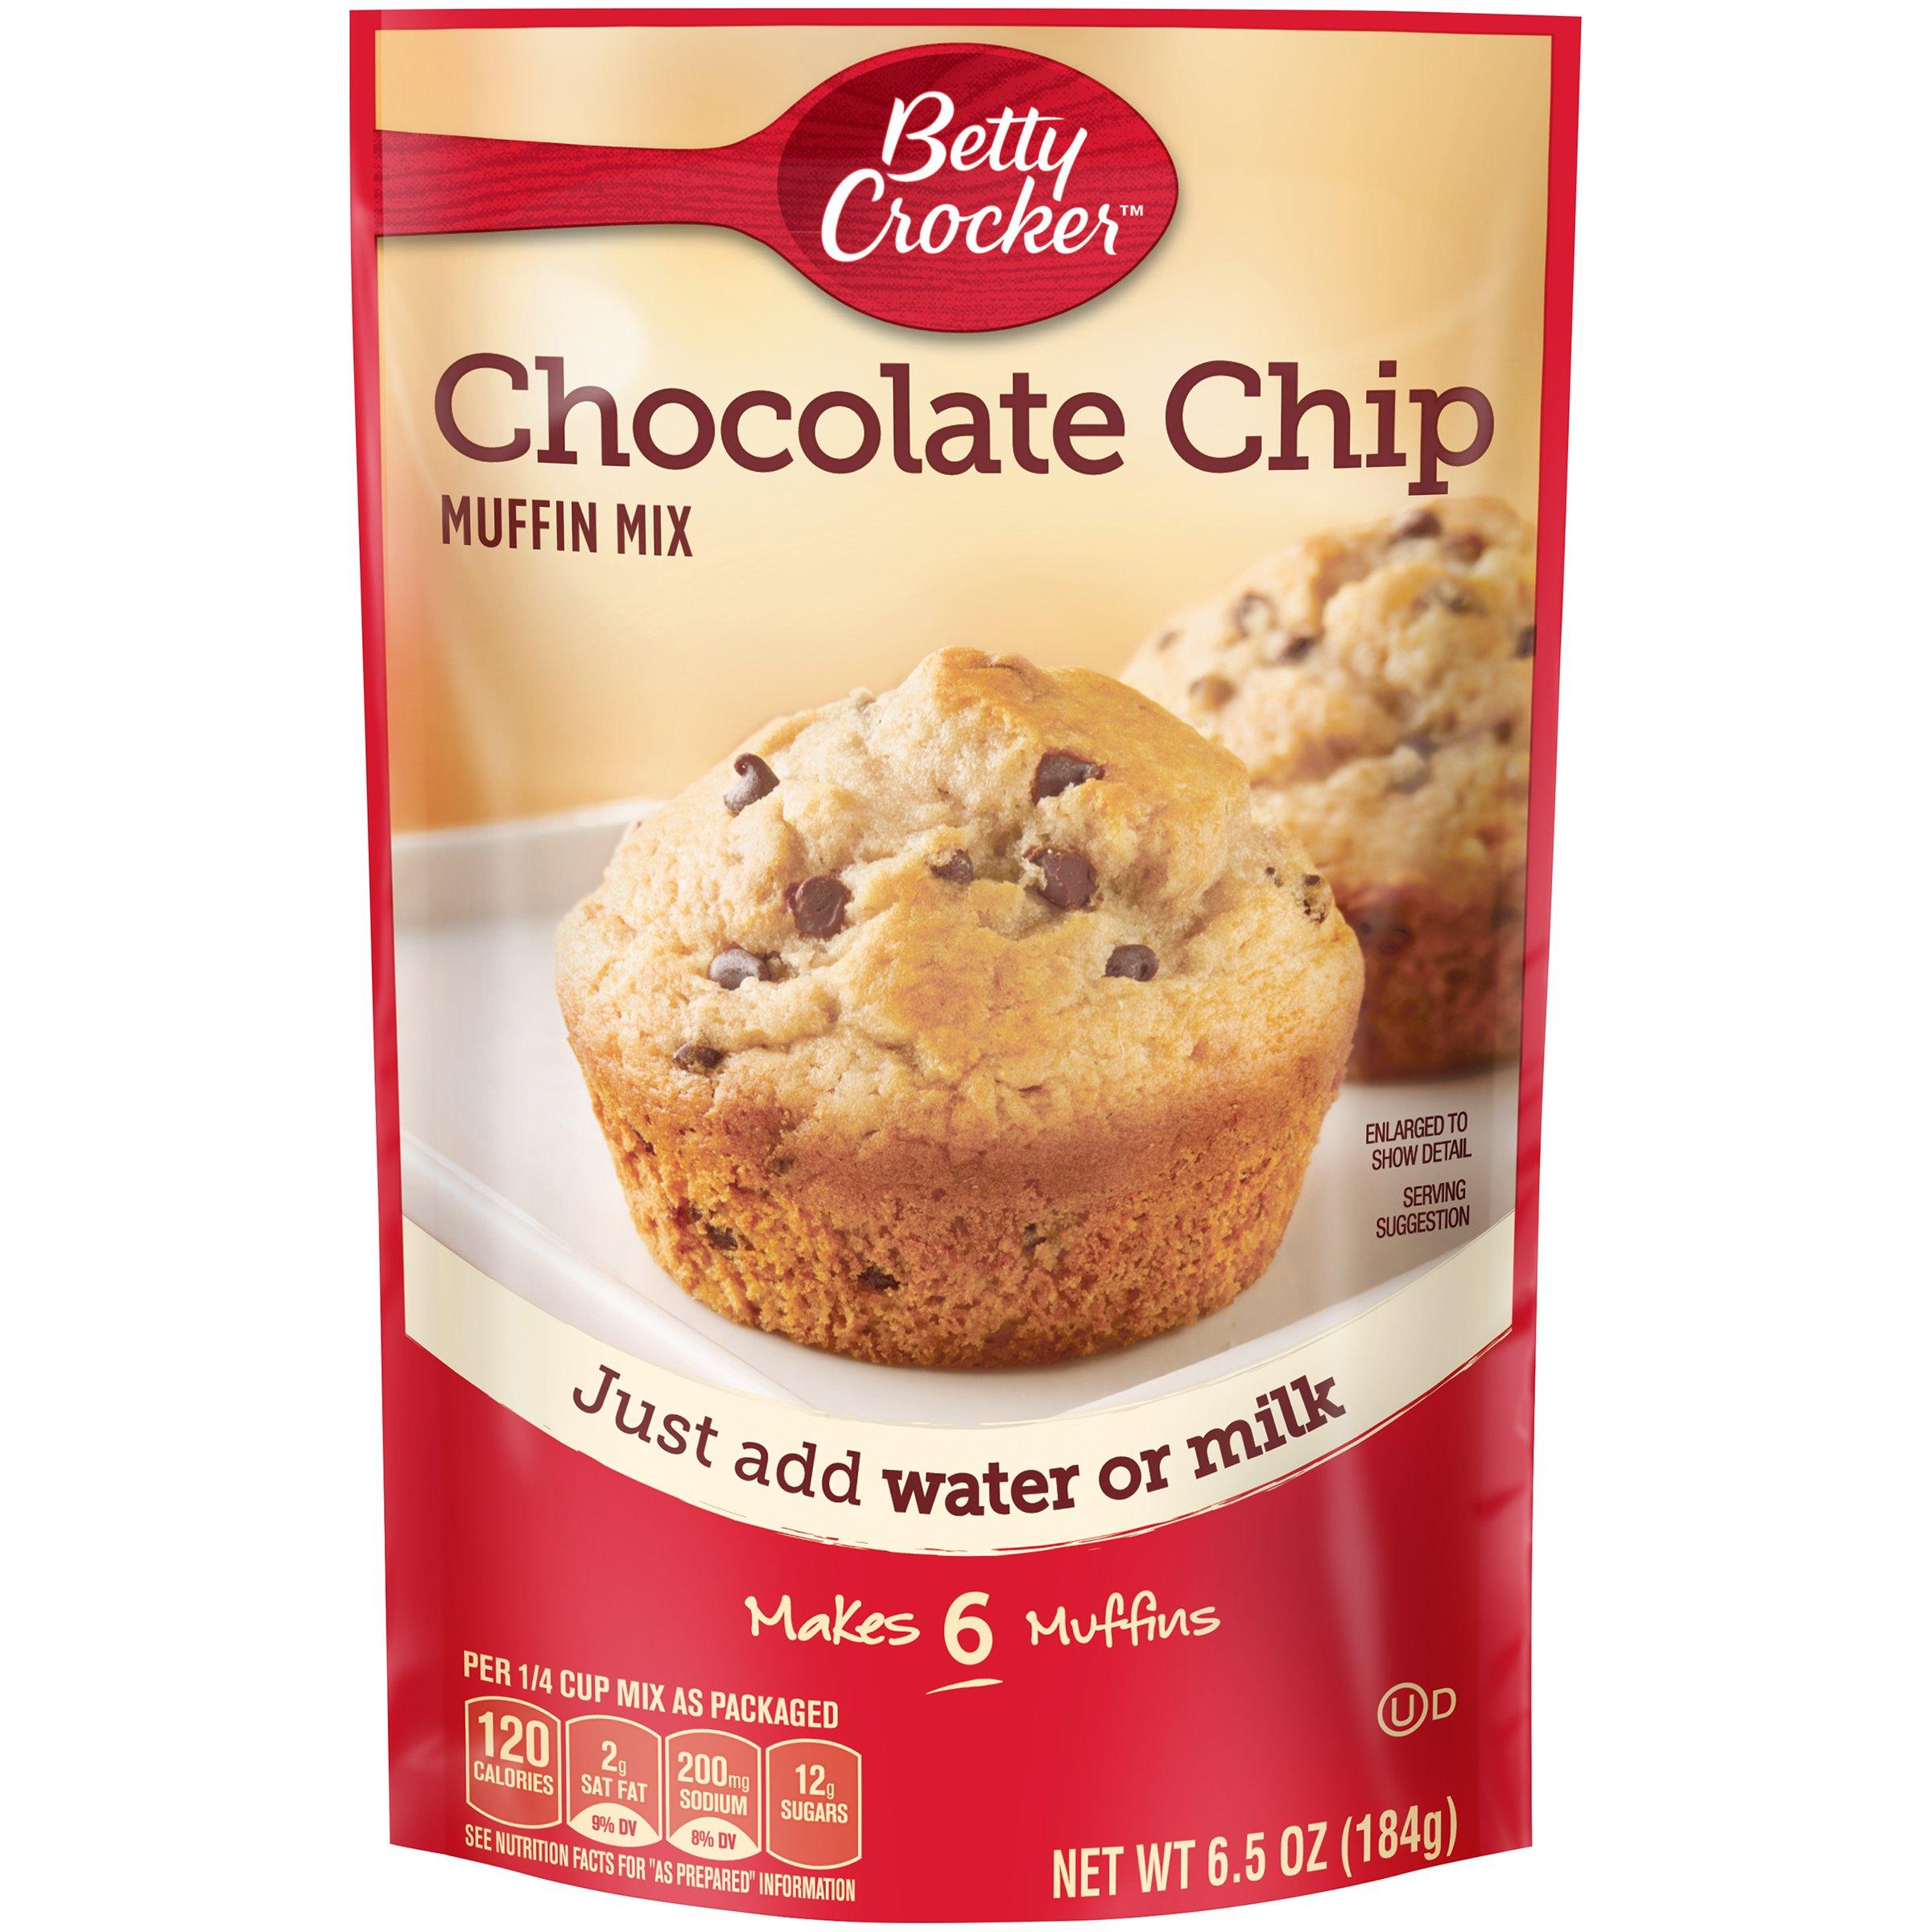 Betty Crocker Chocolate Chip Muffin Mix, 6.5 Ounce